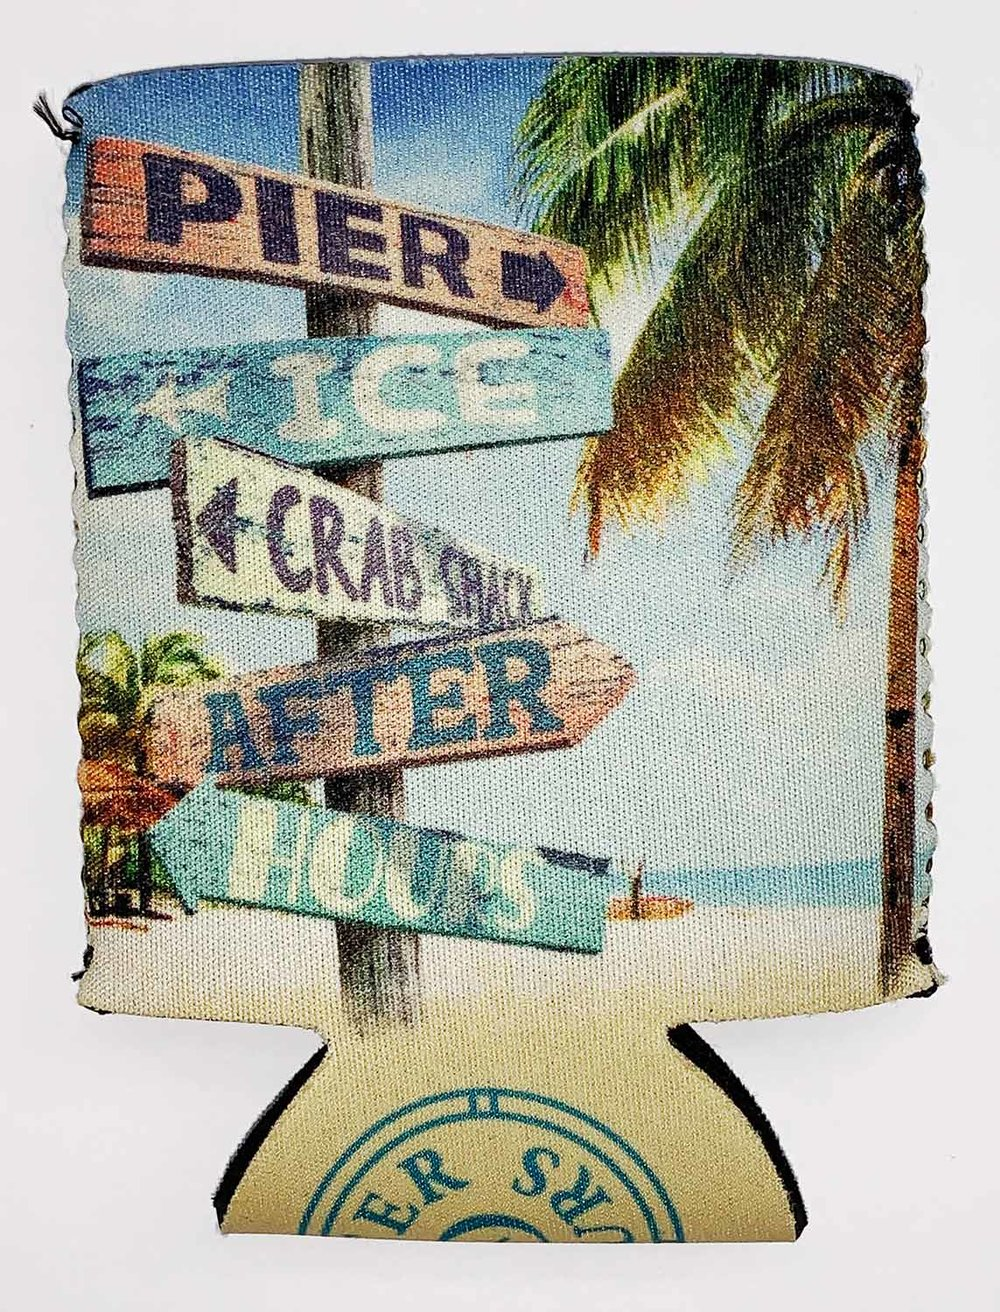 KYC_AfterHours_beachsignscoozies_web.jpg